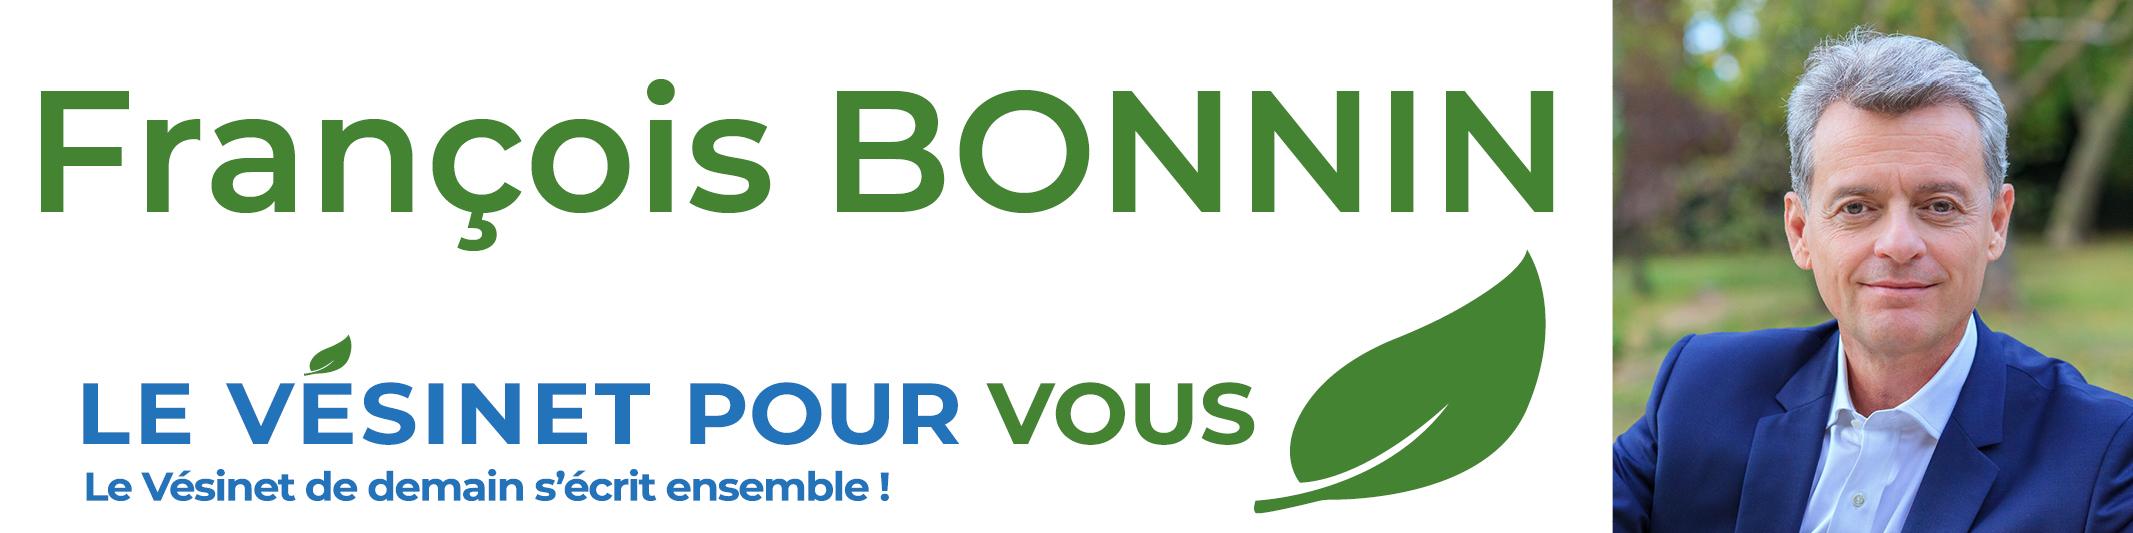 François BONNIN